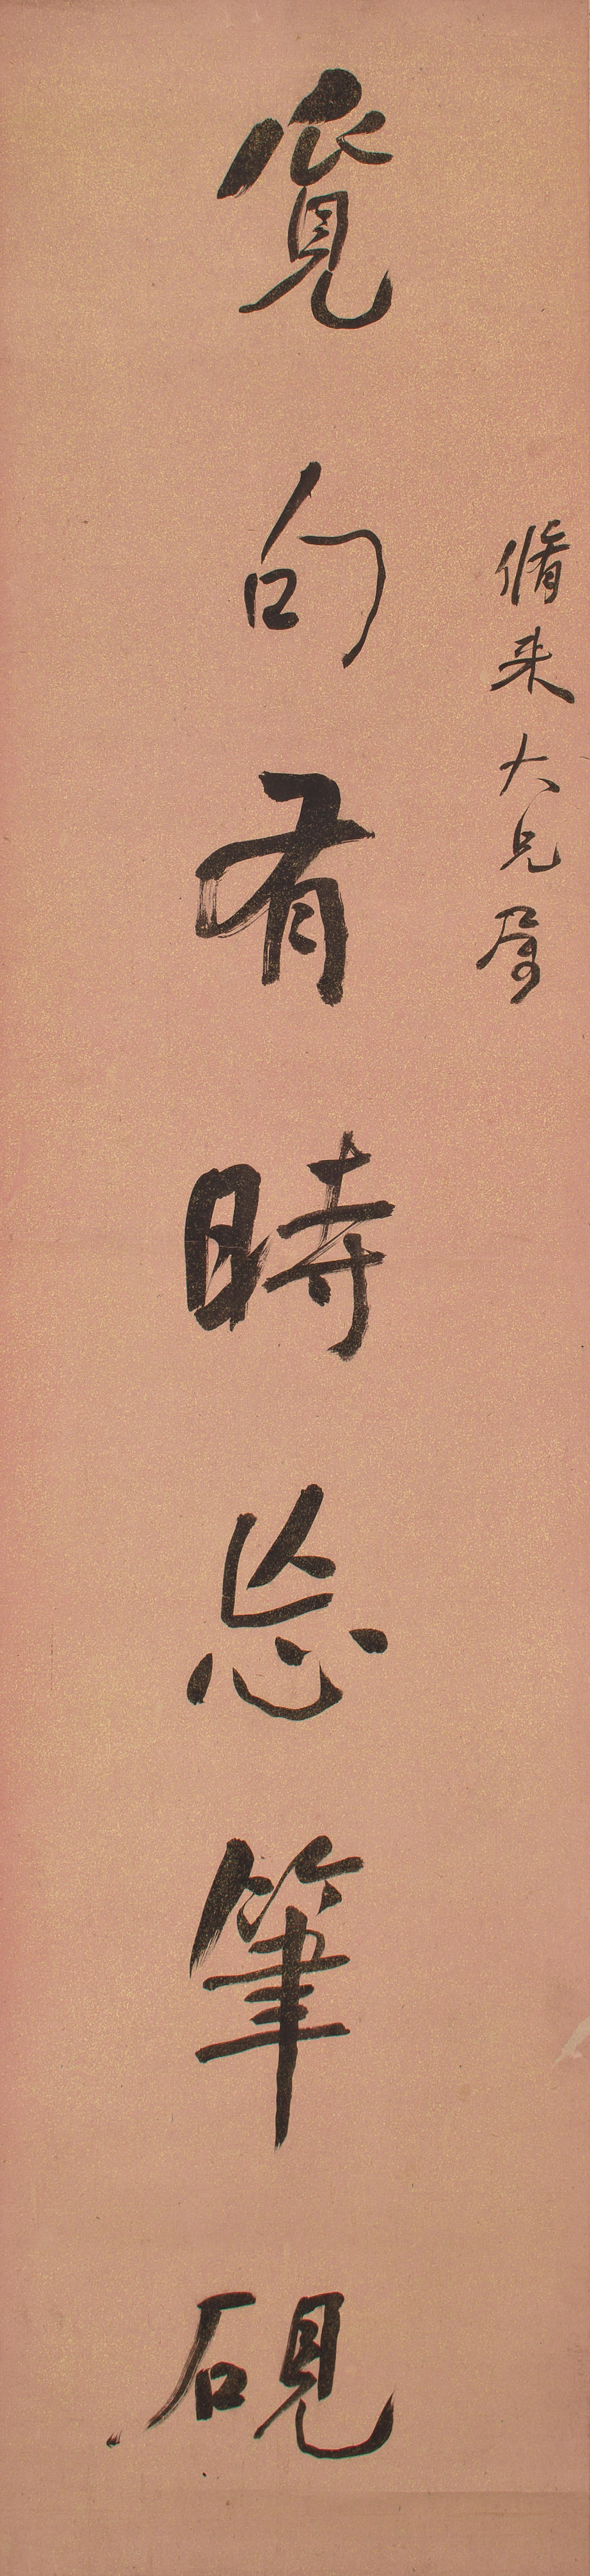 He Shaoji (1799-1873) Calligraphic Couplet